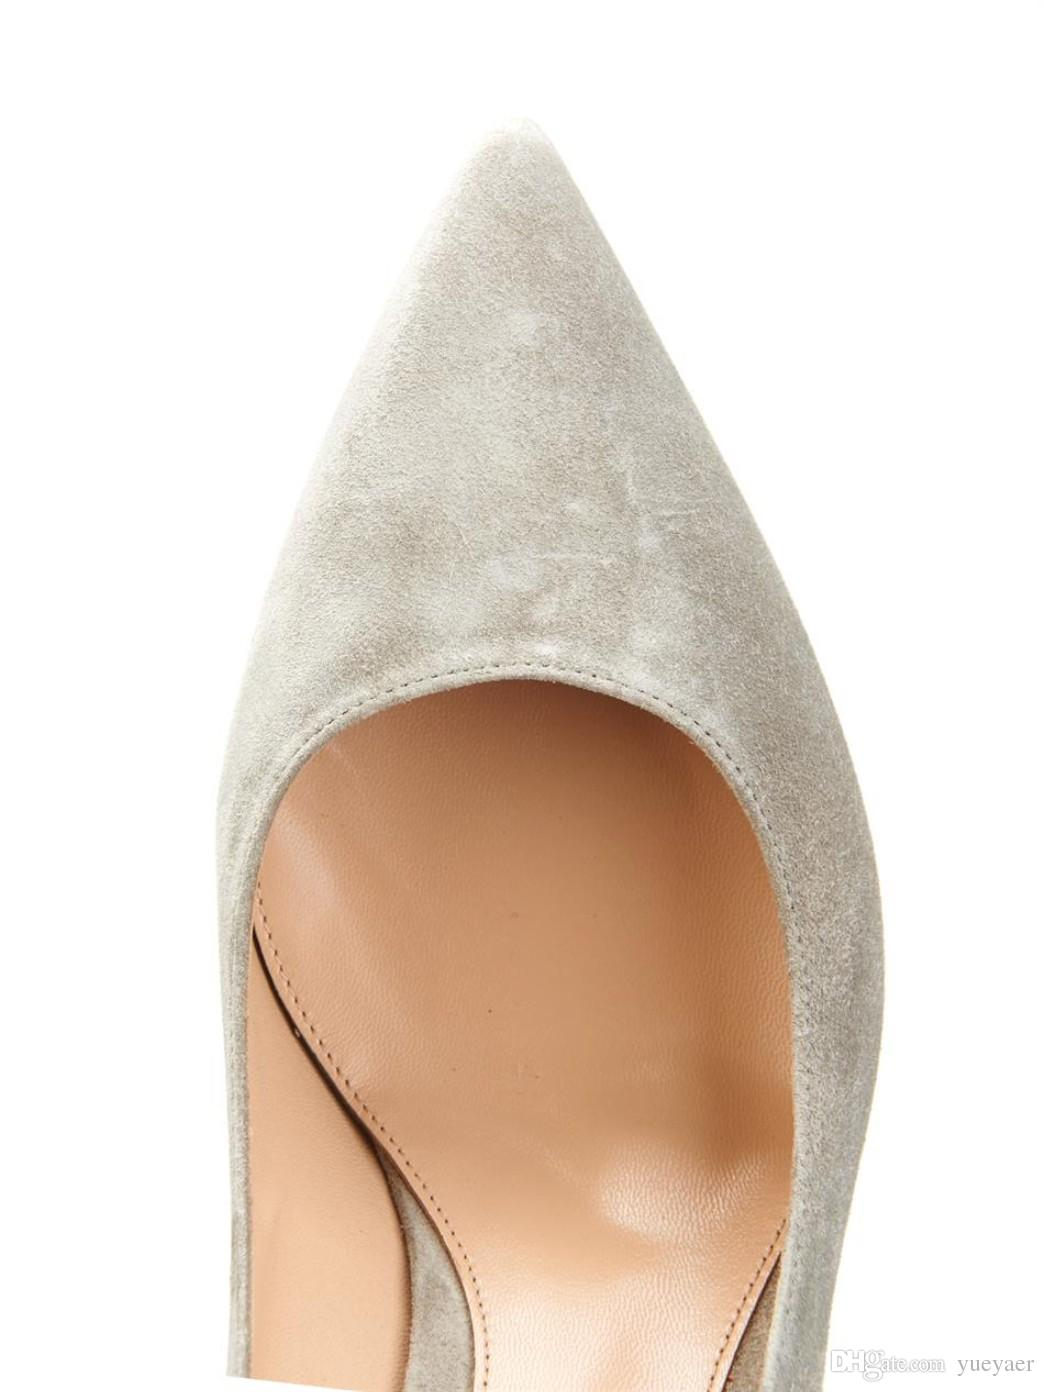 Zandina Handmade Fashion 8cm High Heel Pumps Simple Style Slip-on Pointy Party Evening Wedding Stiletto Shoes Camel